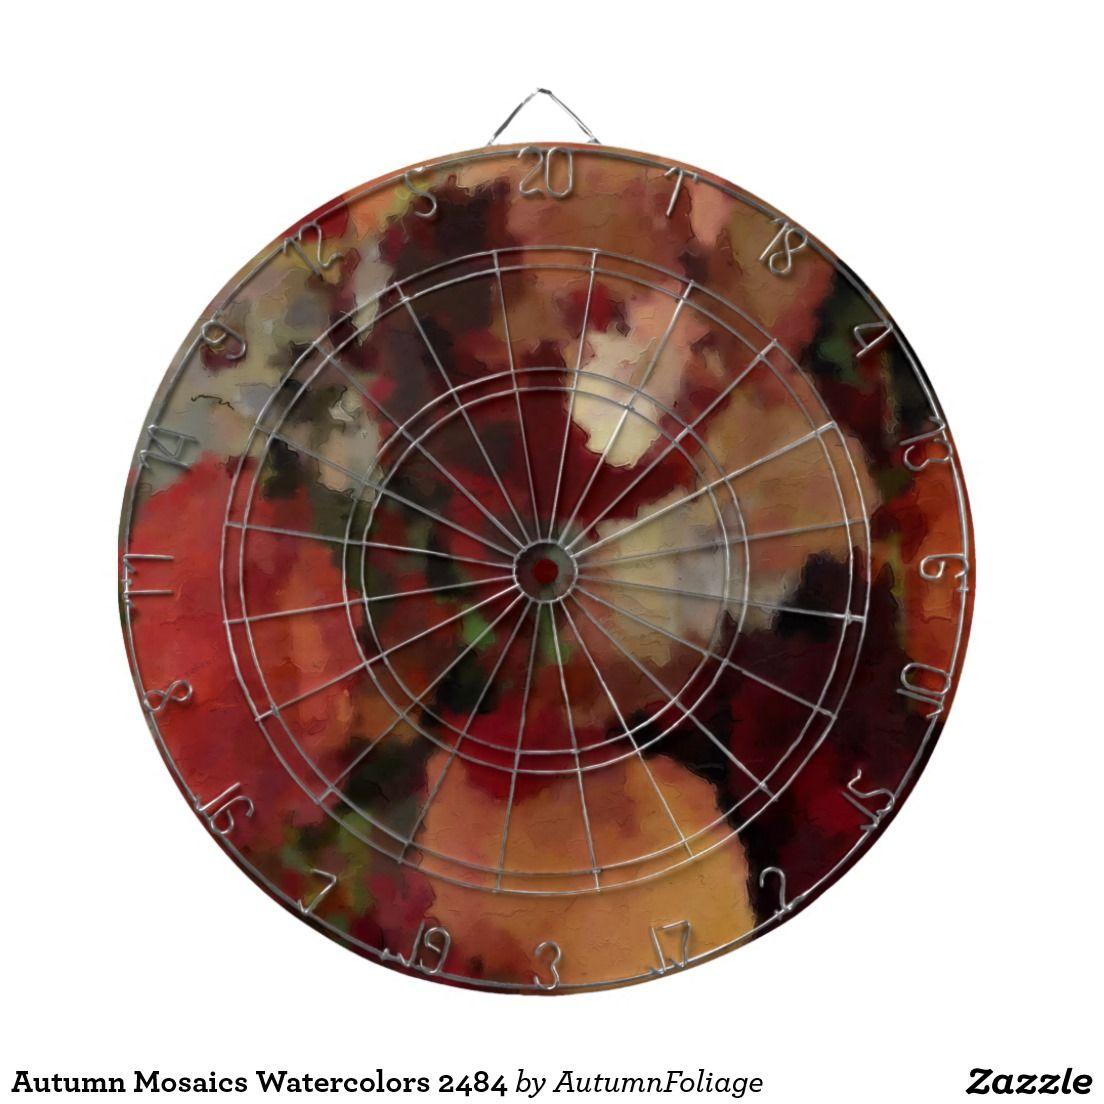 Autumn Mosaics Watercolors 2484 Dartboard